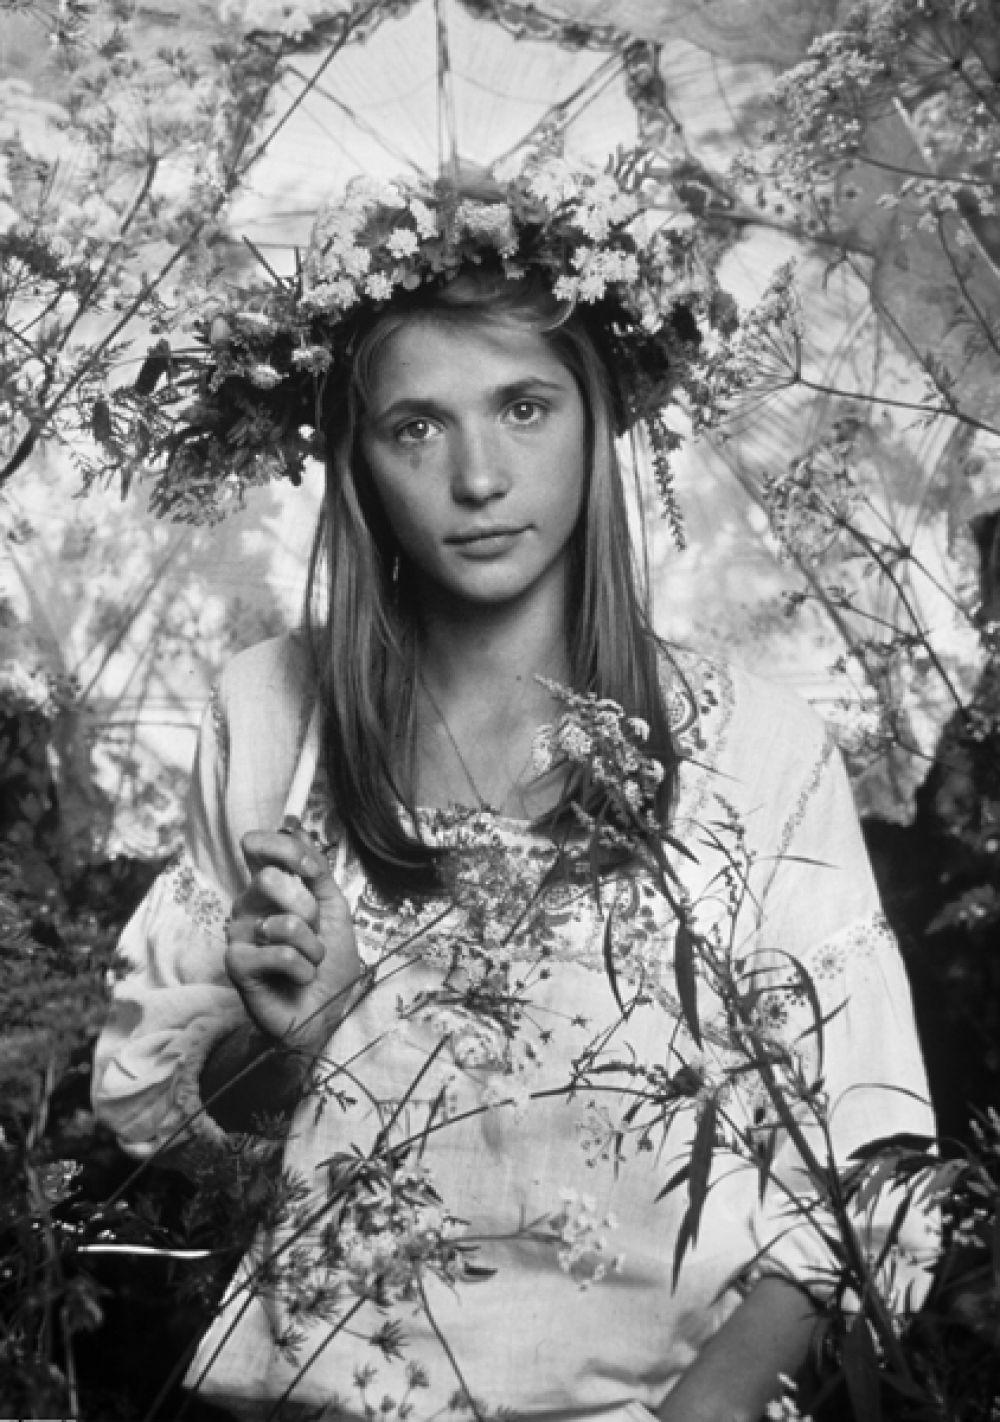 Советская актриса Вера Глаголева. 1985 год.